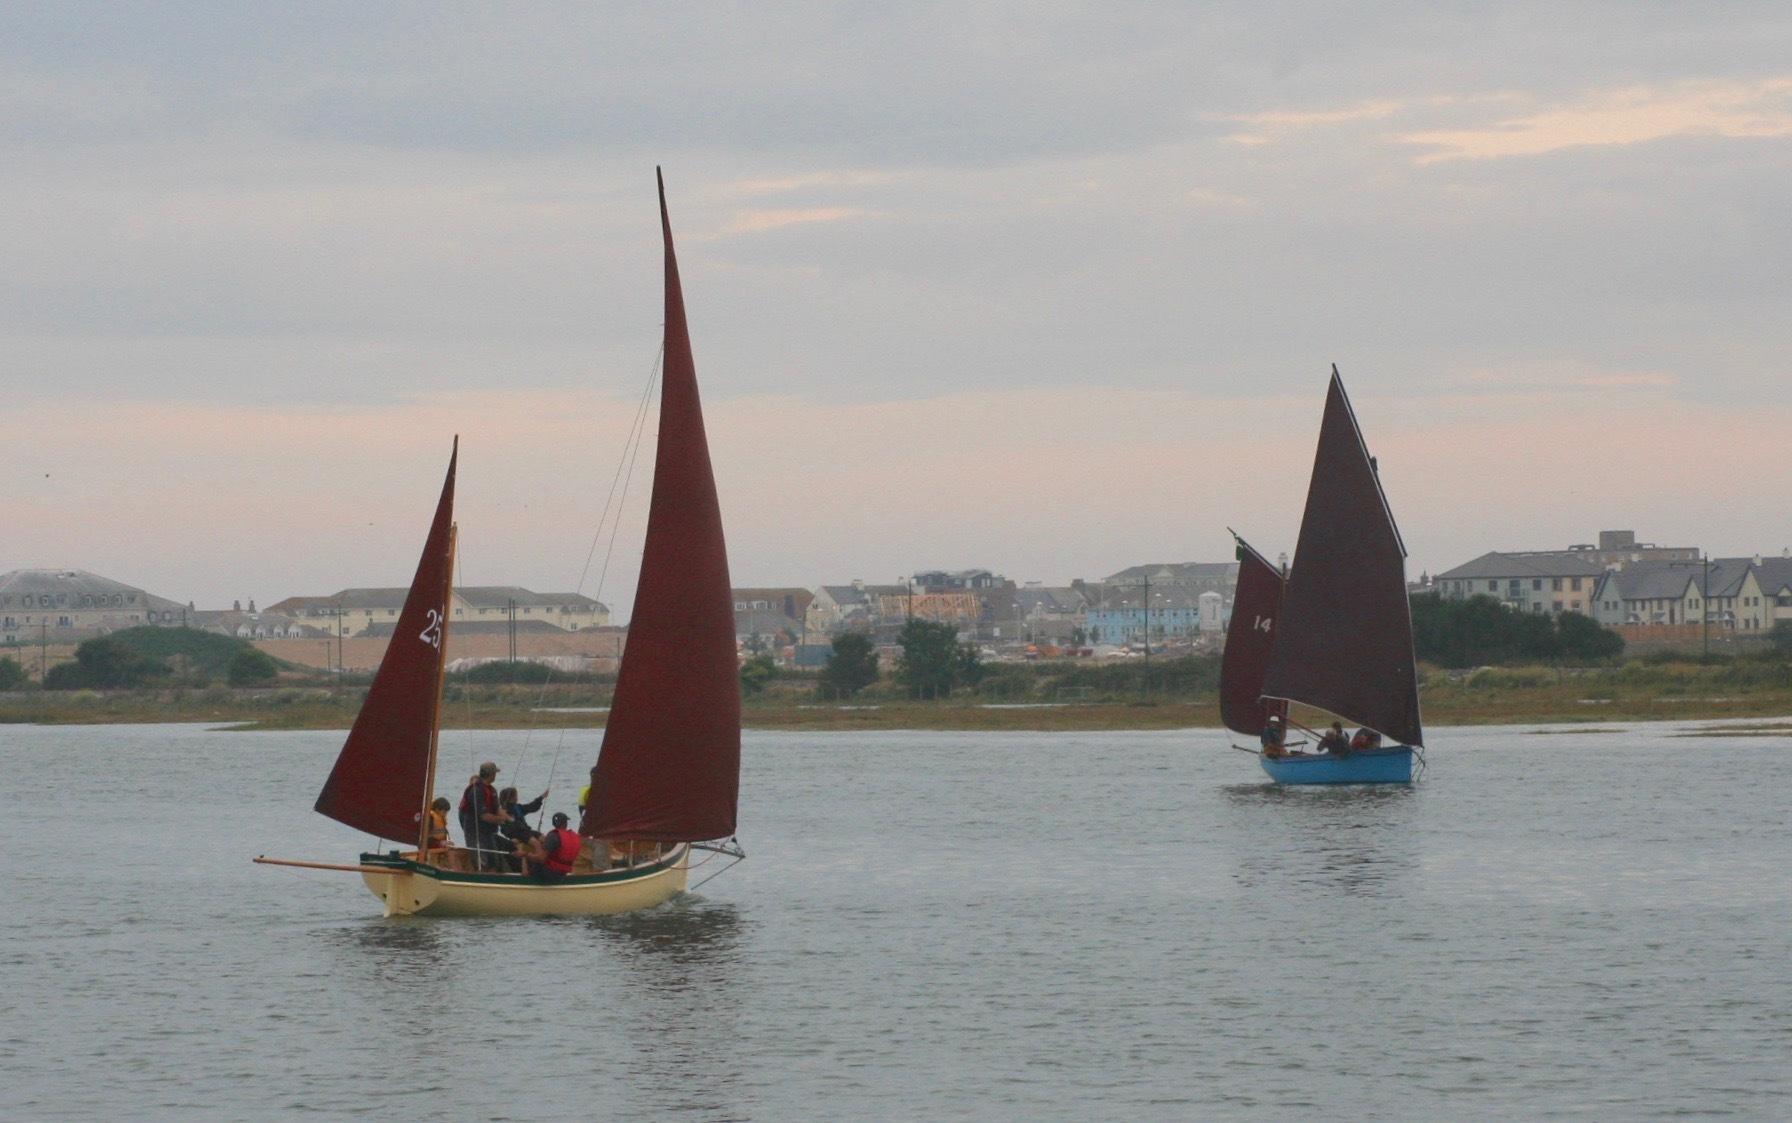 Axe Yacht Club Cadets Enjoy Luggers River Race